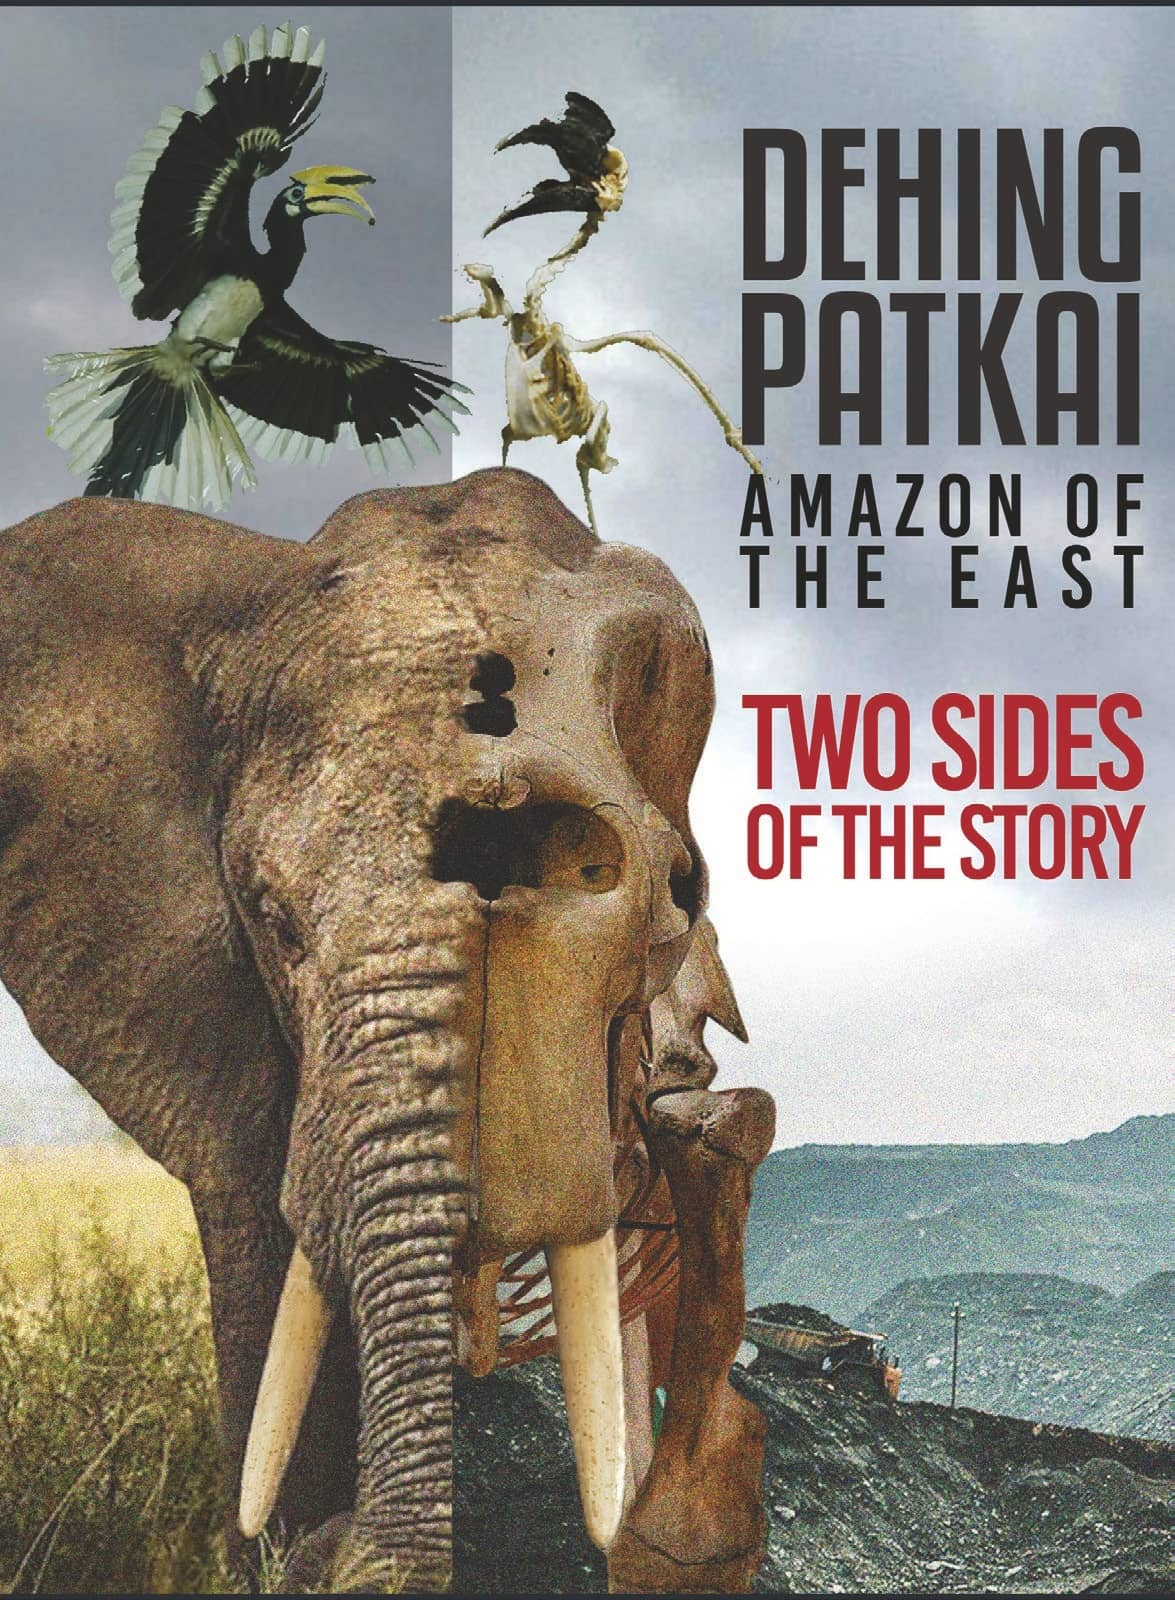 DEHING PATKAI AMAZON OF THE EAST